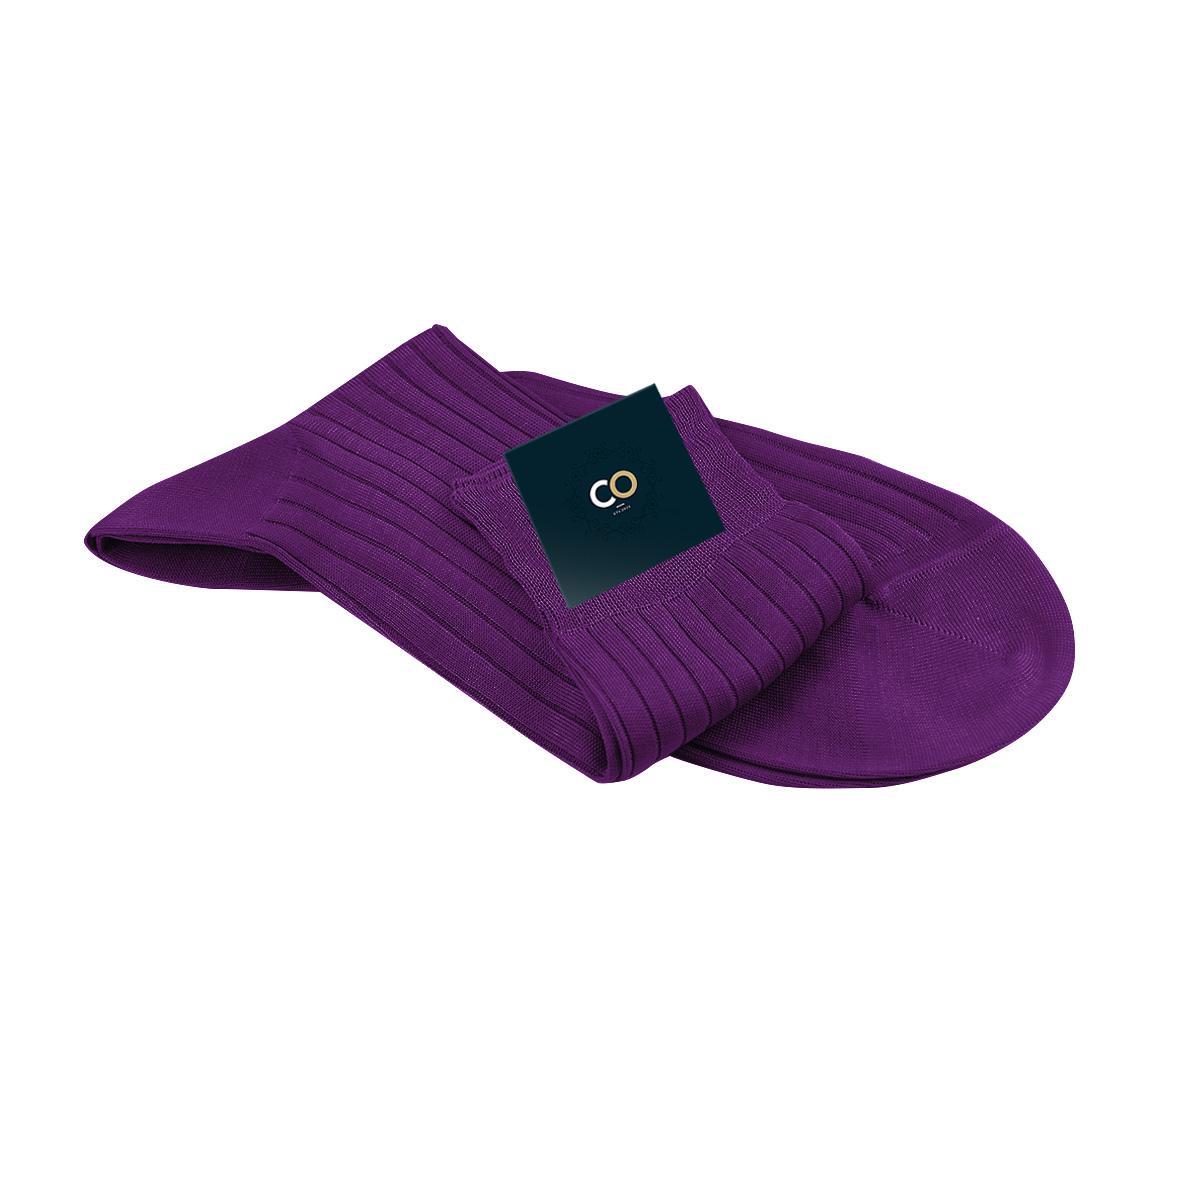 Chaussette Virgile, Hyper violet